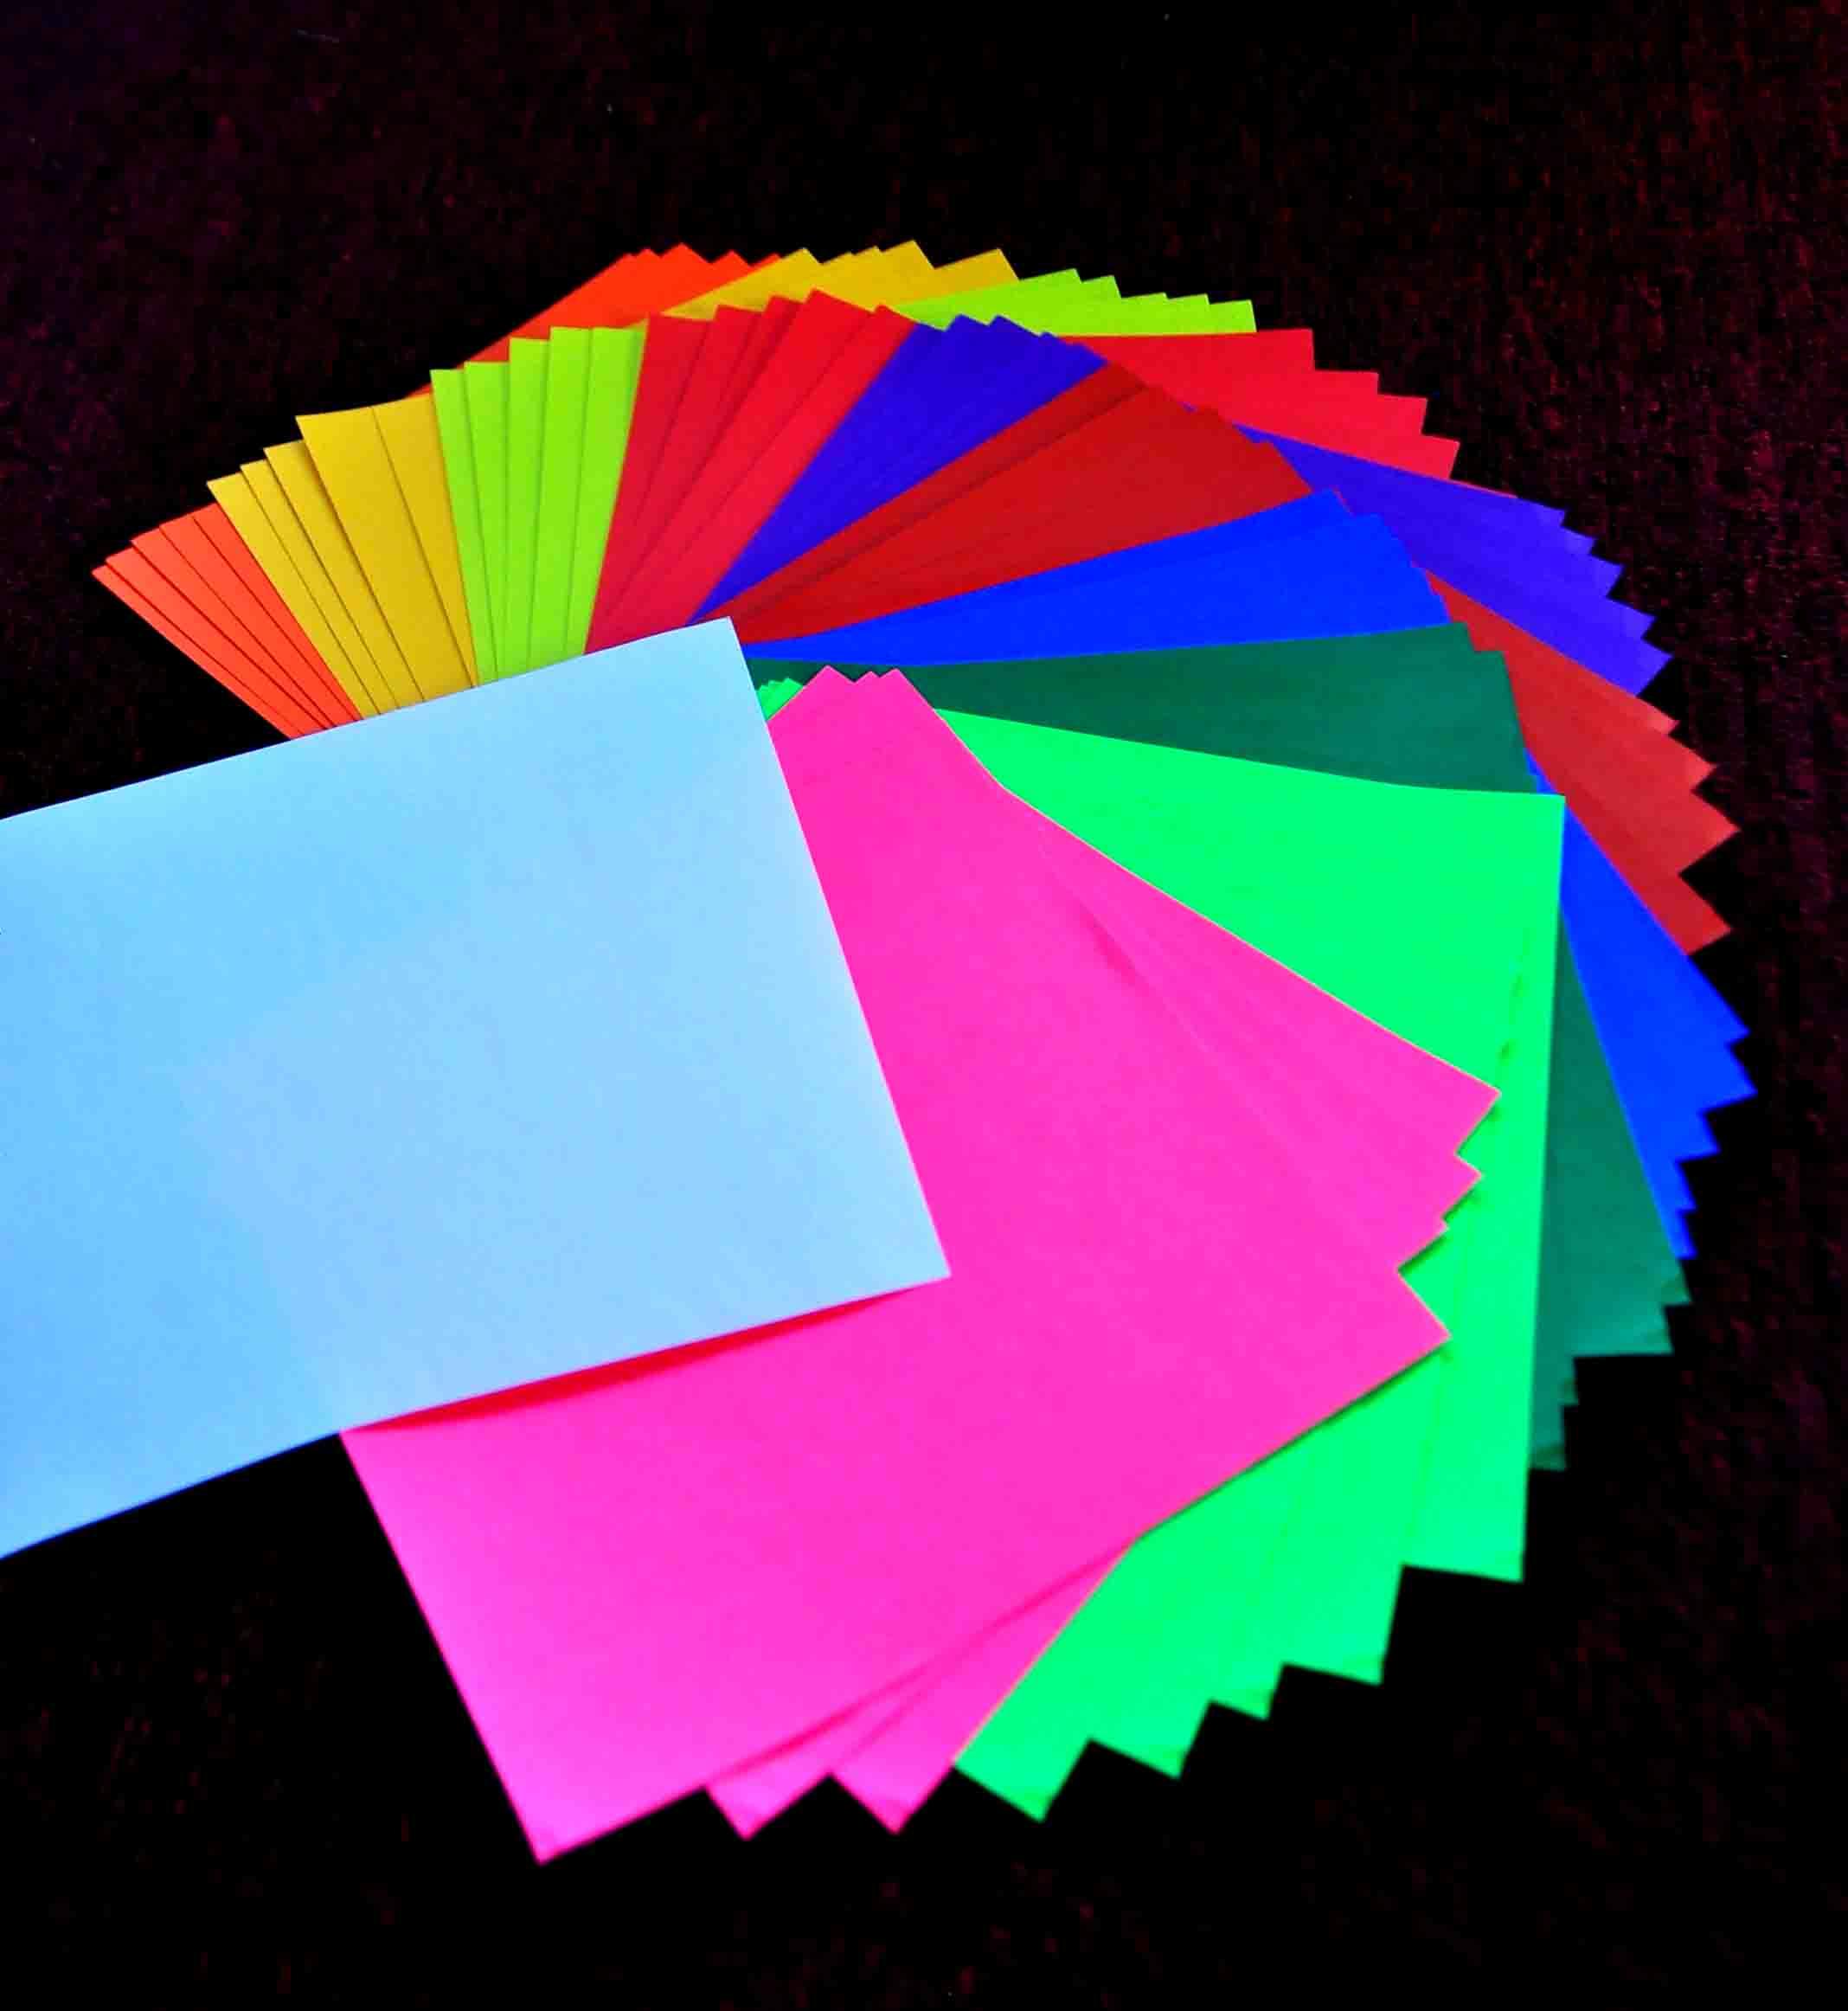 Kertas Origami berwarna 2 Layer murah di bandung | Matgami ...